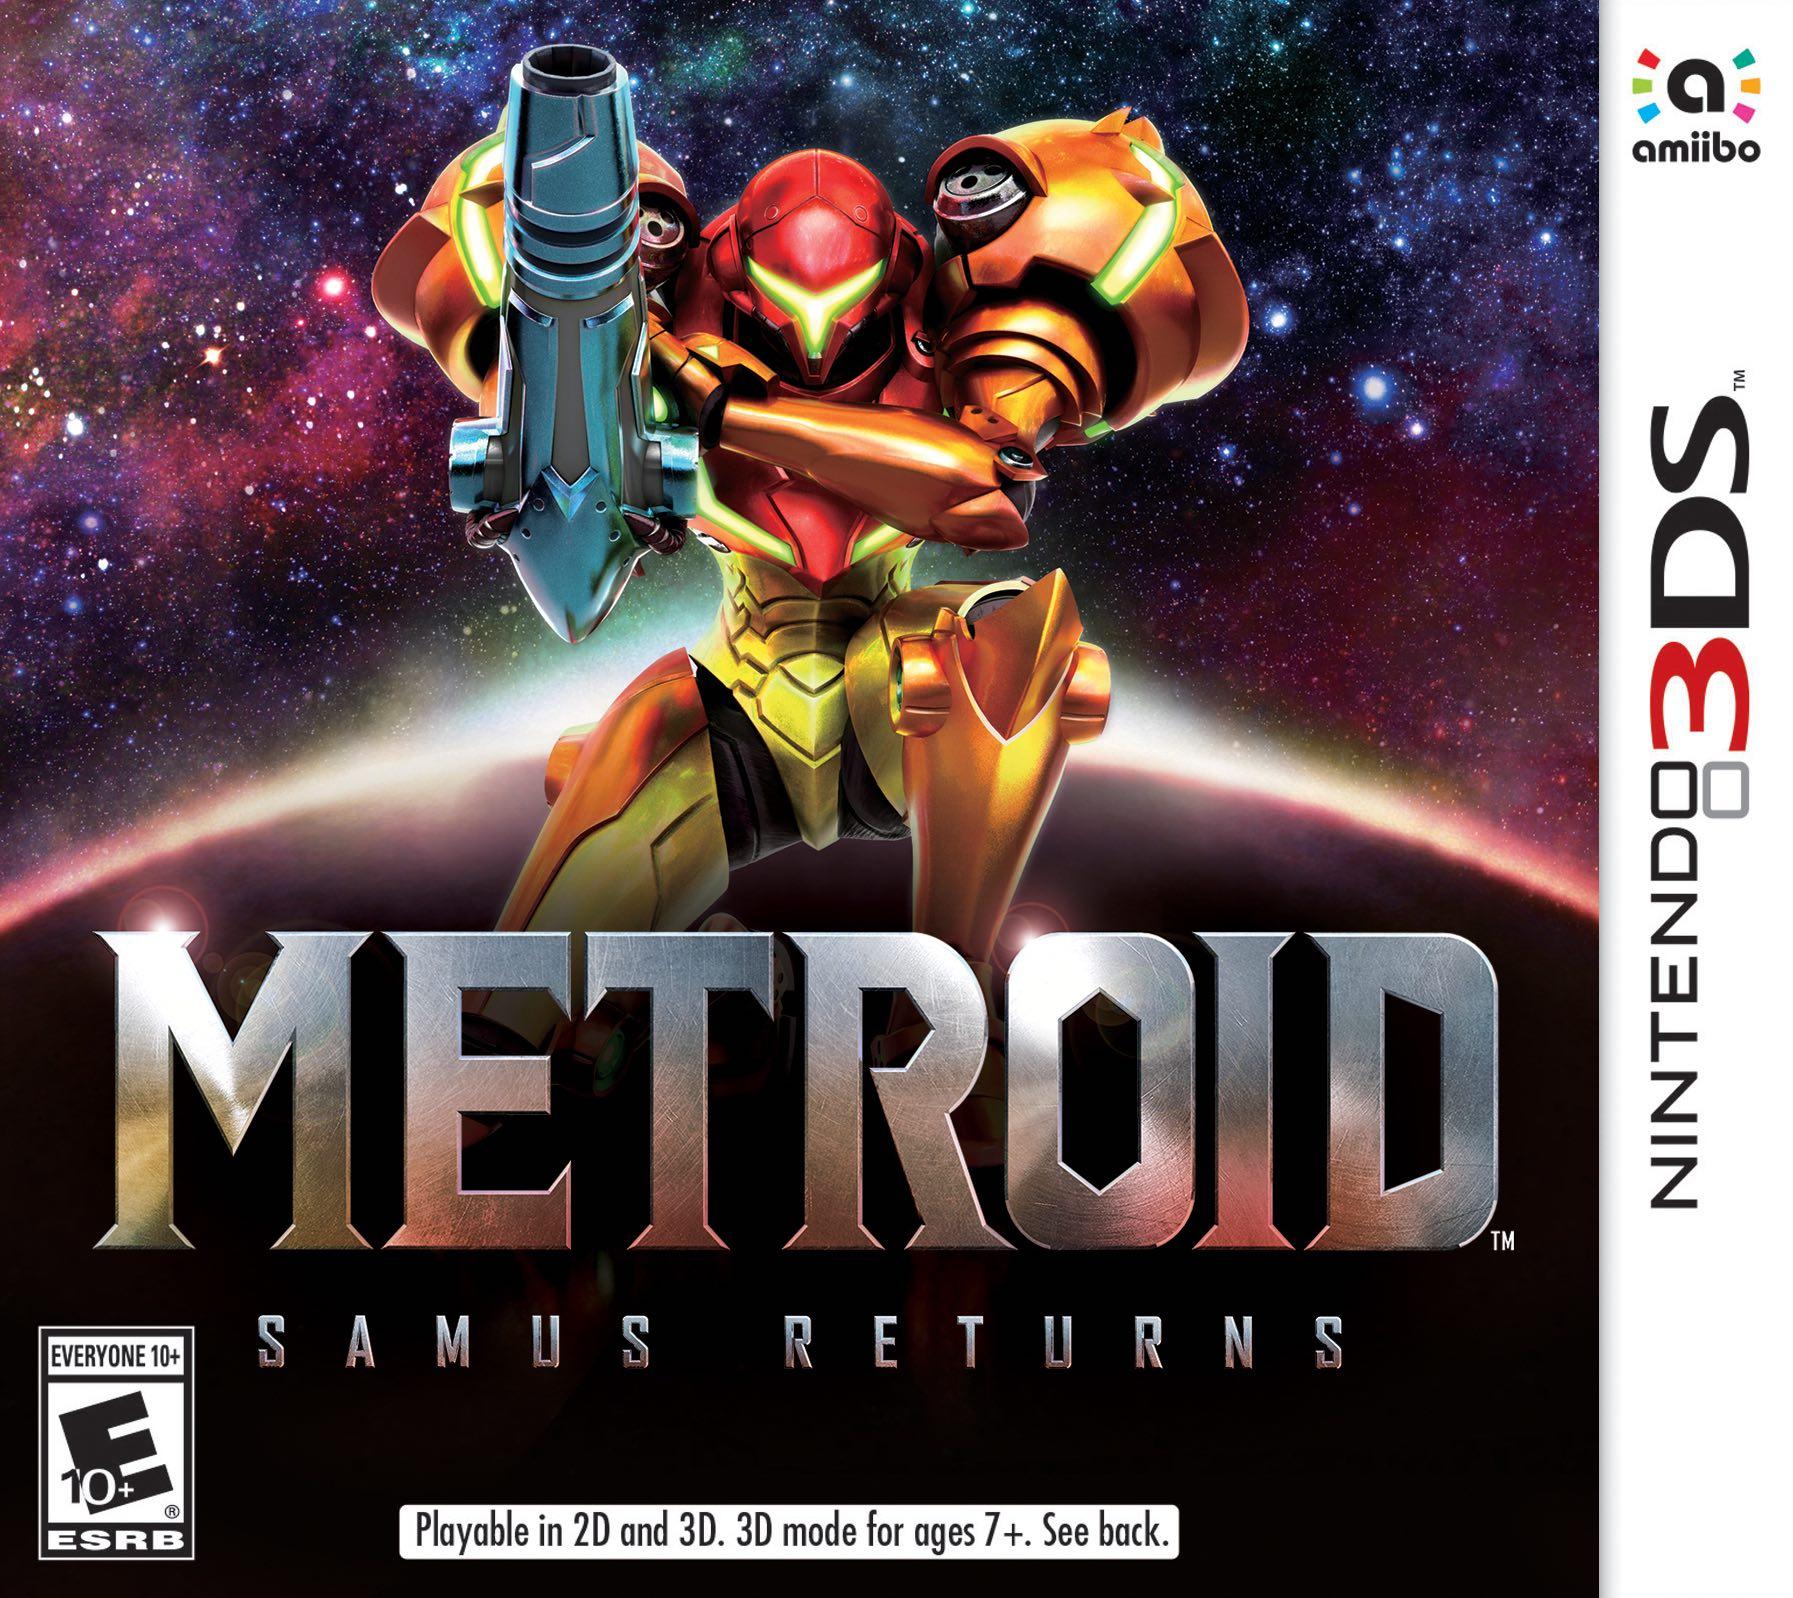 metroid-samus-returns-pack-shot